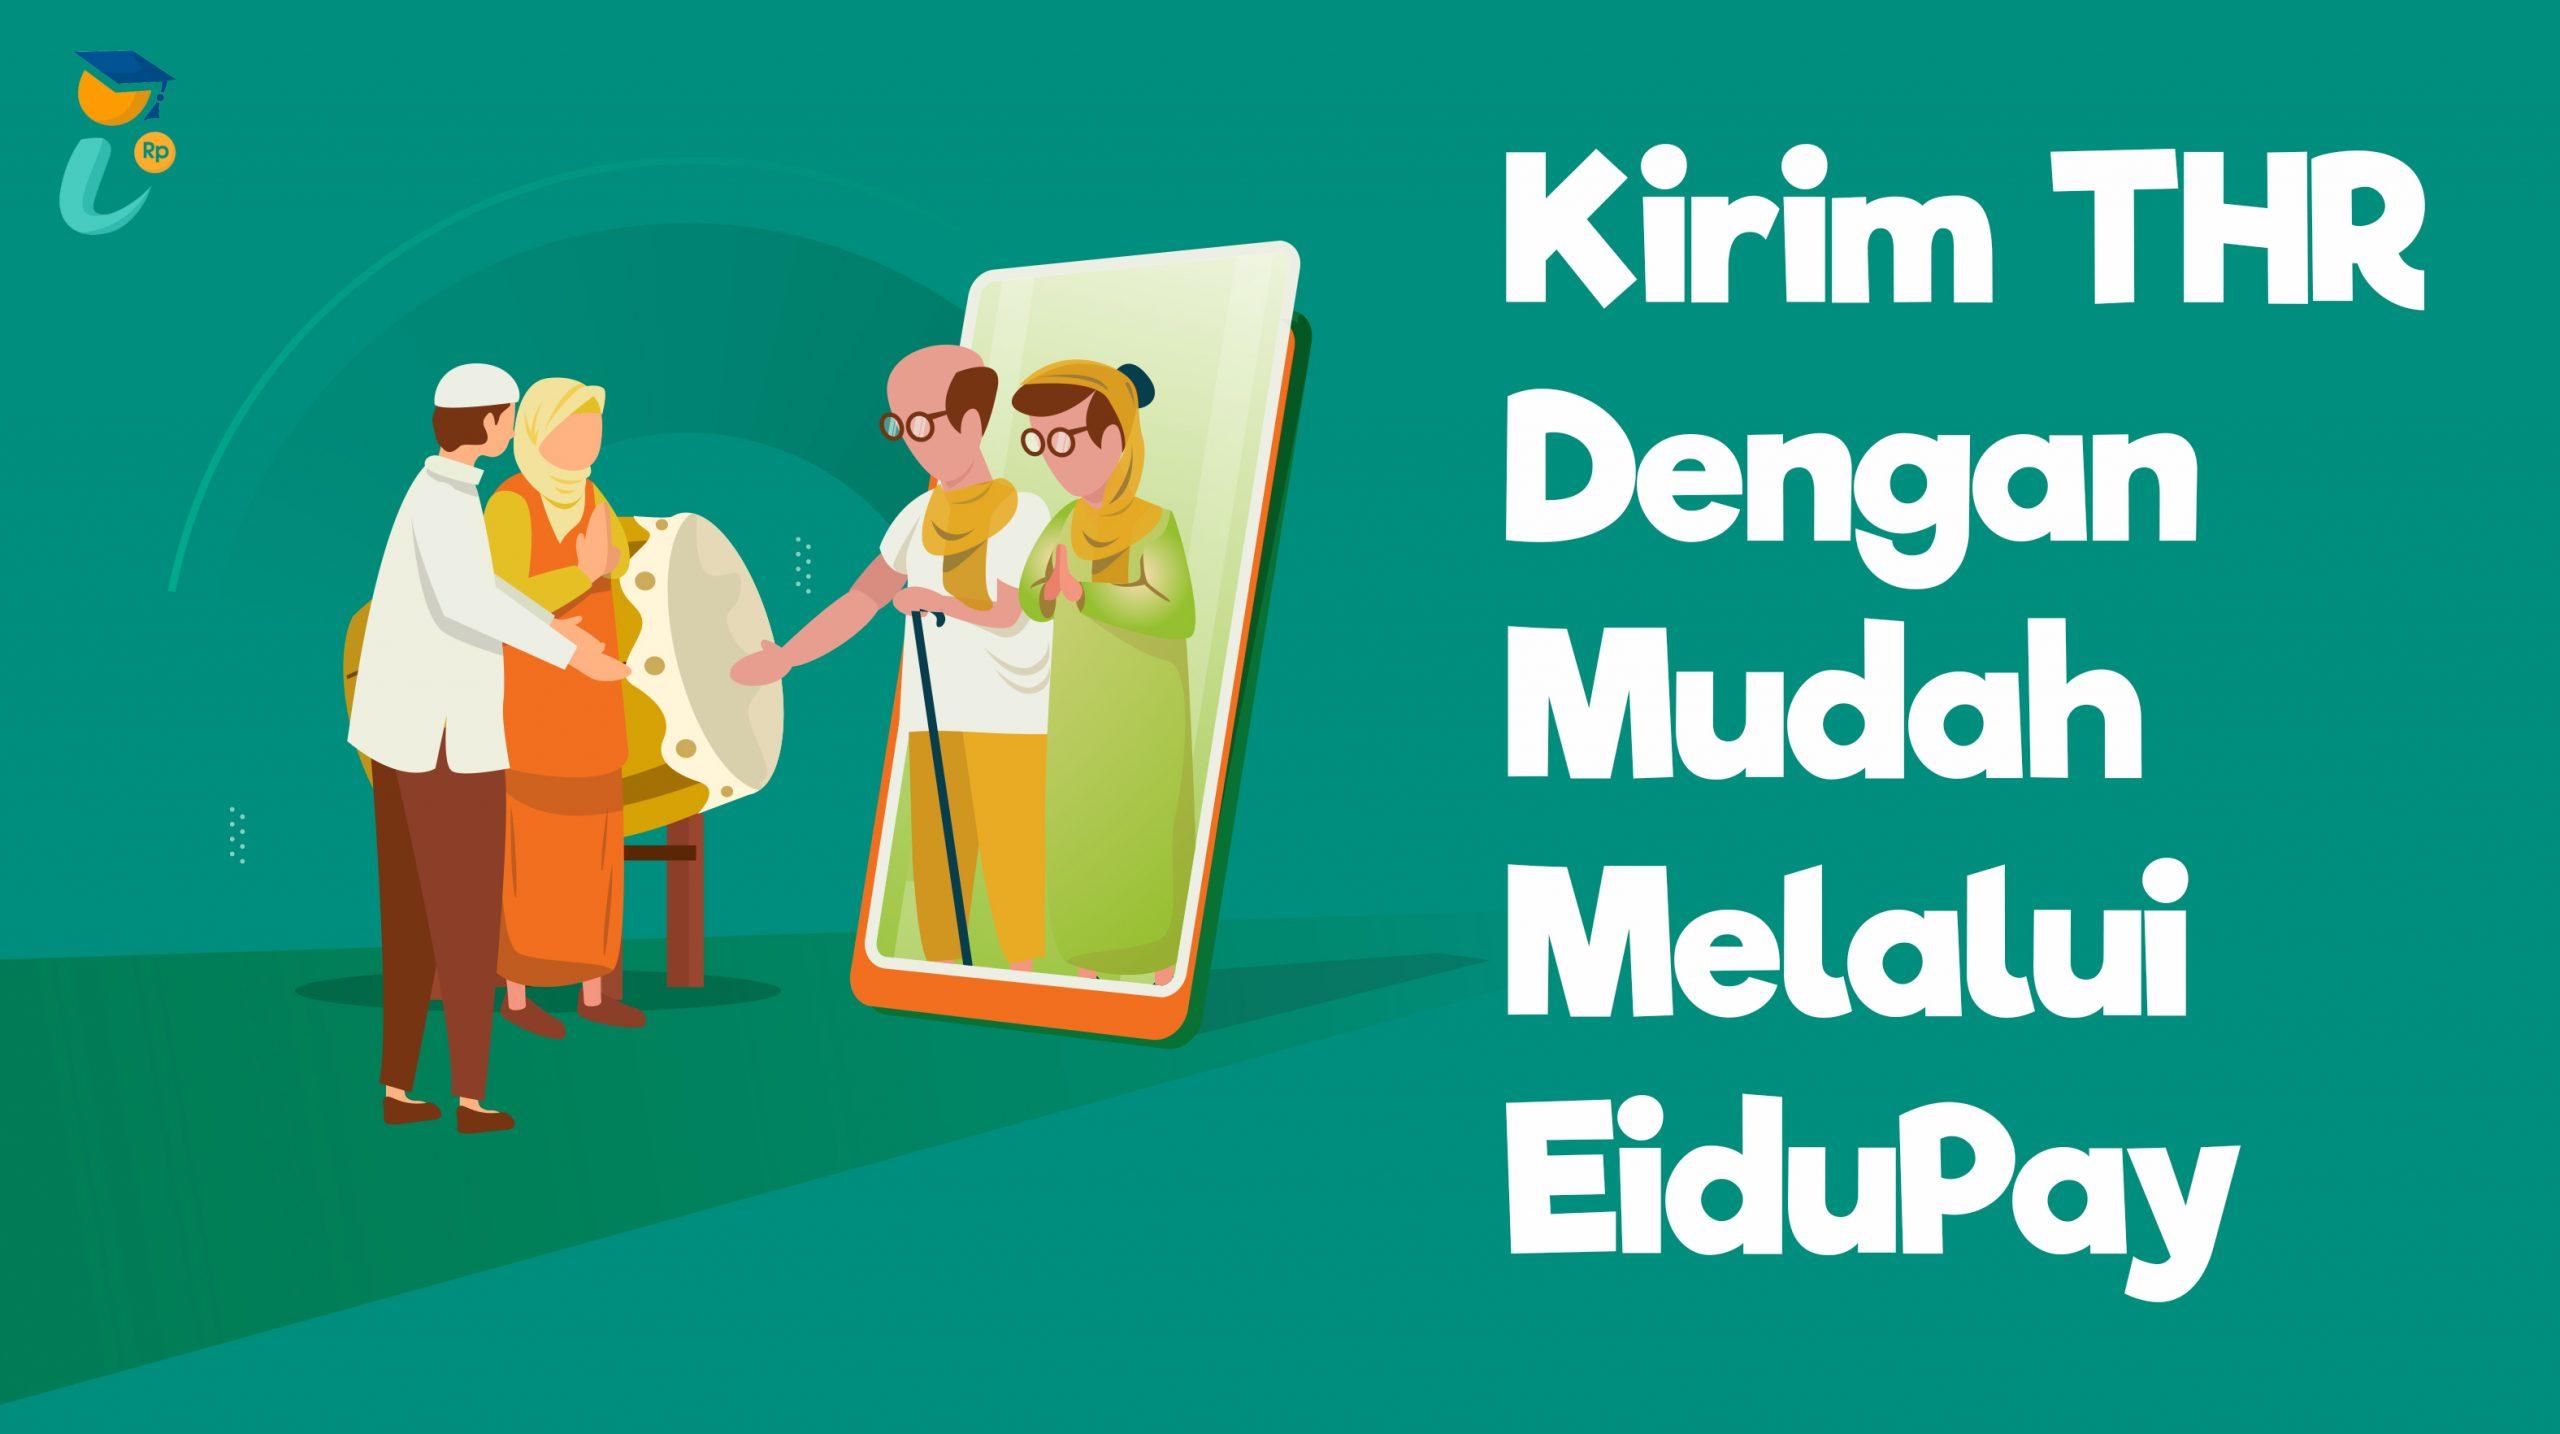 Kirim THR Dengan Mudah Melalui EiduPay